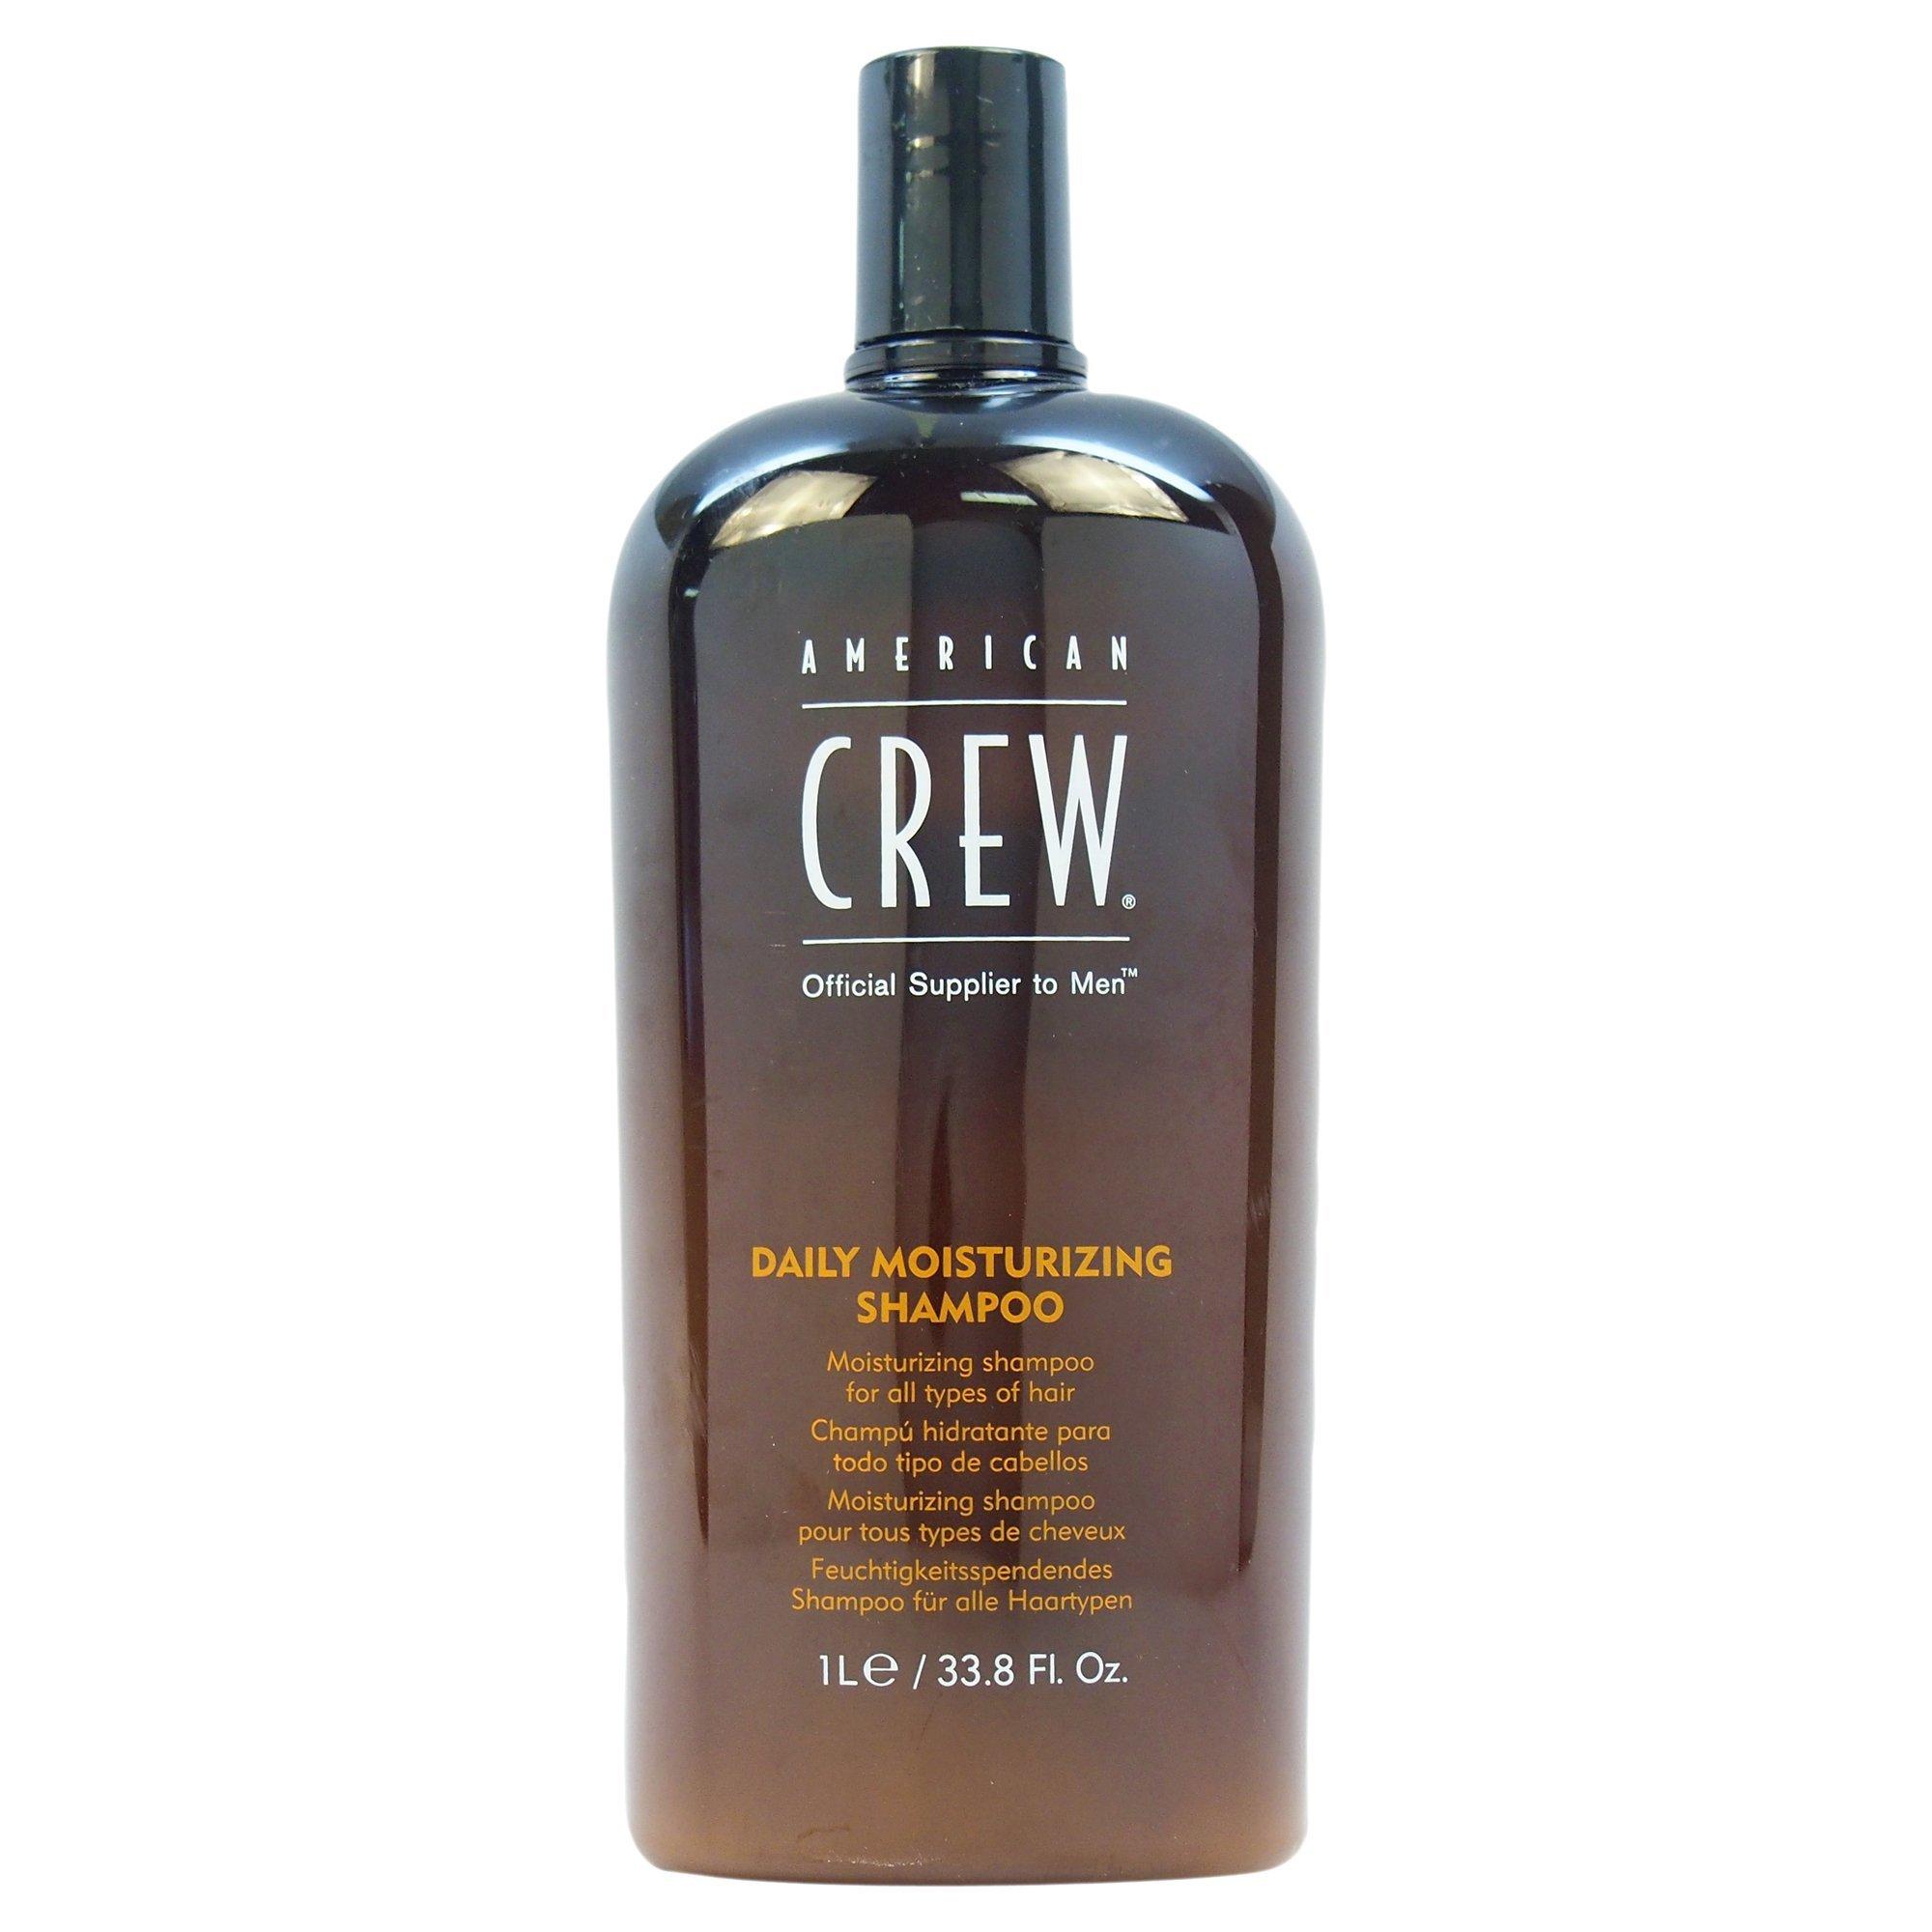 American Crew Daily Moisturizing Shampoo by American Crew for Unisex - 33.8 oz Shampoo